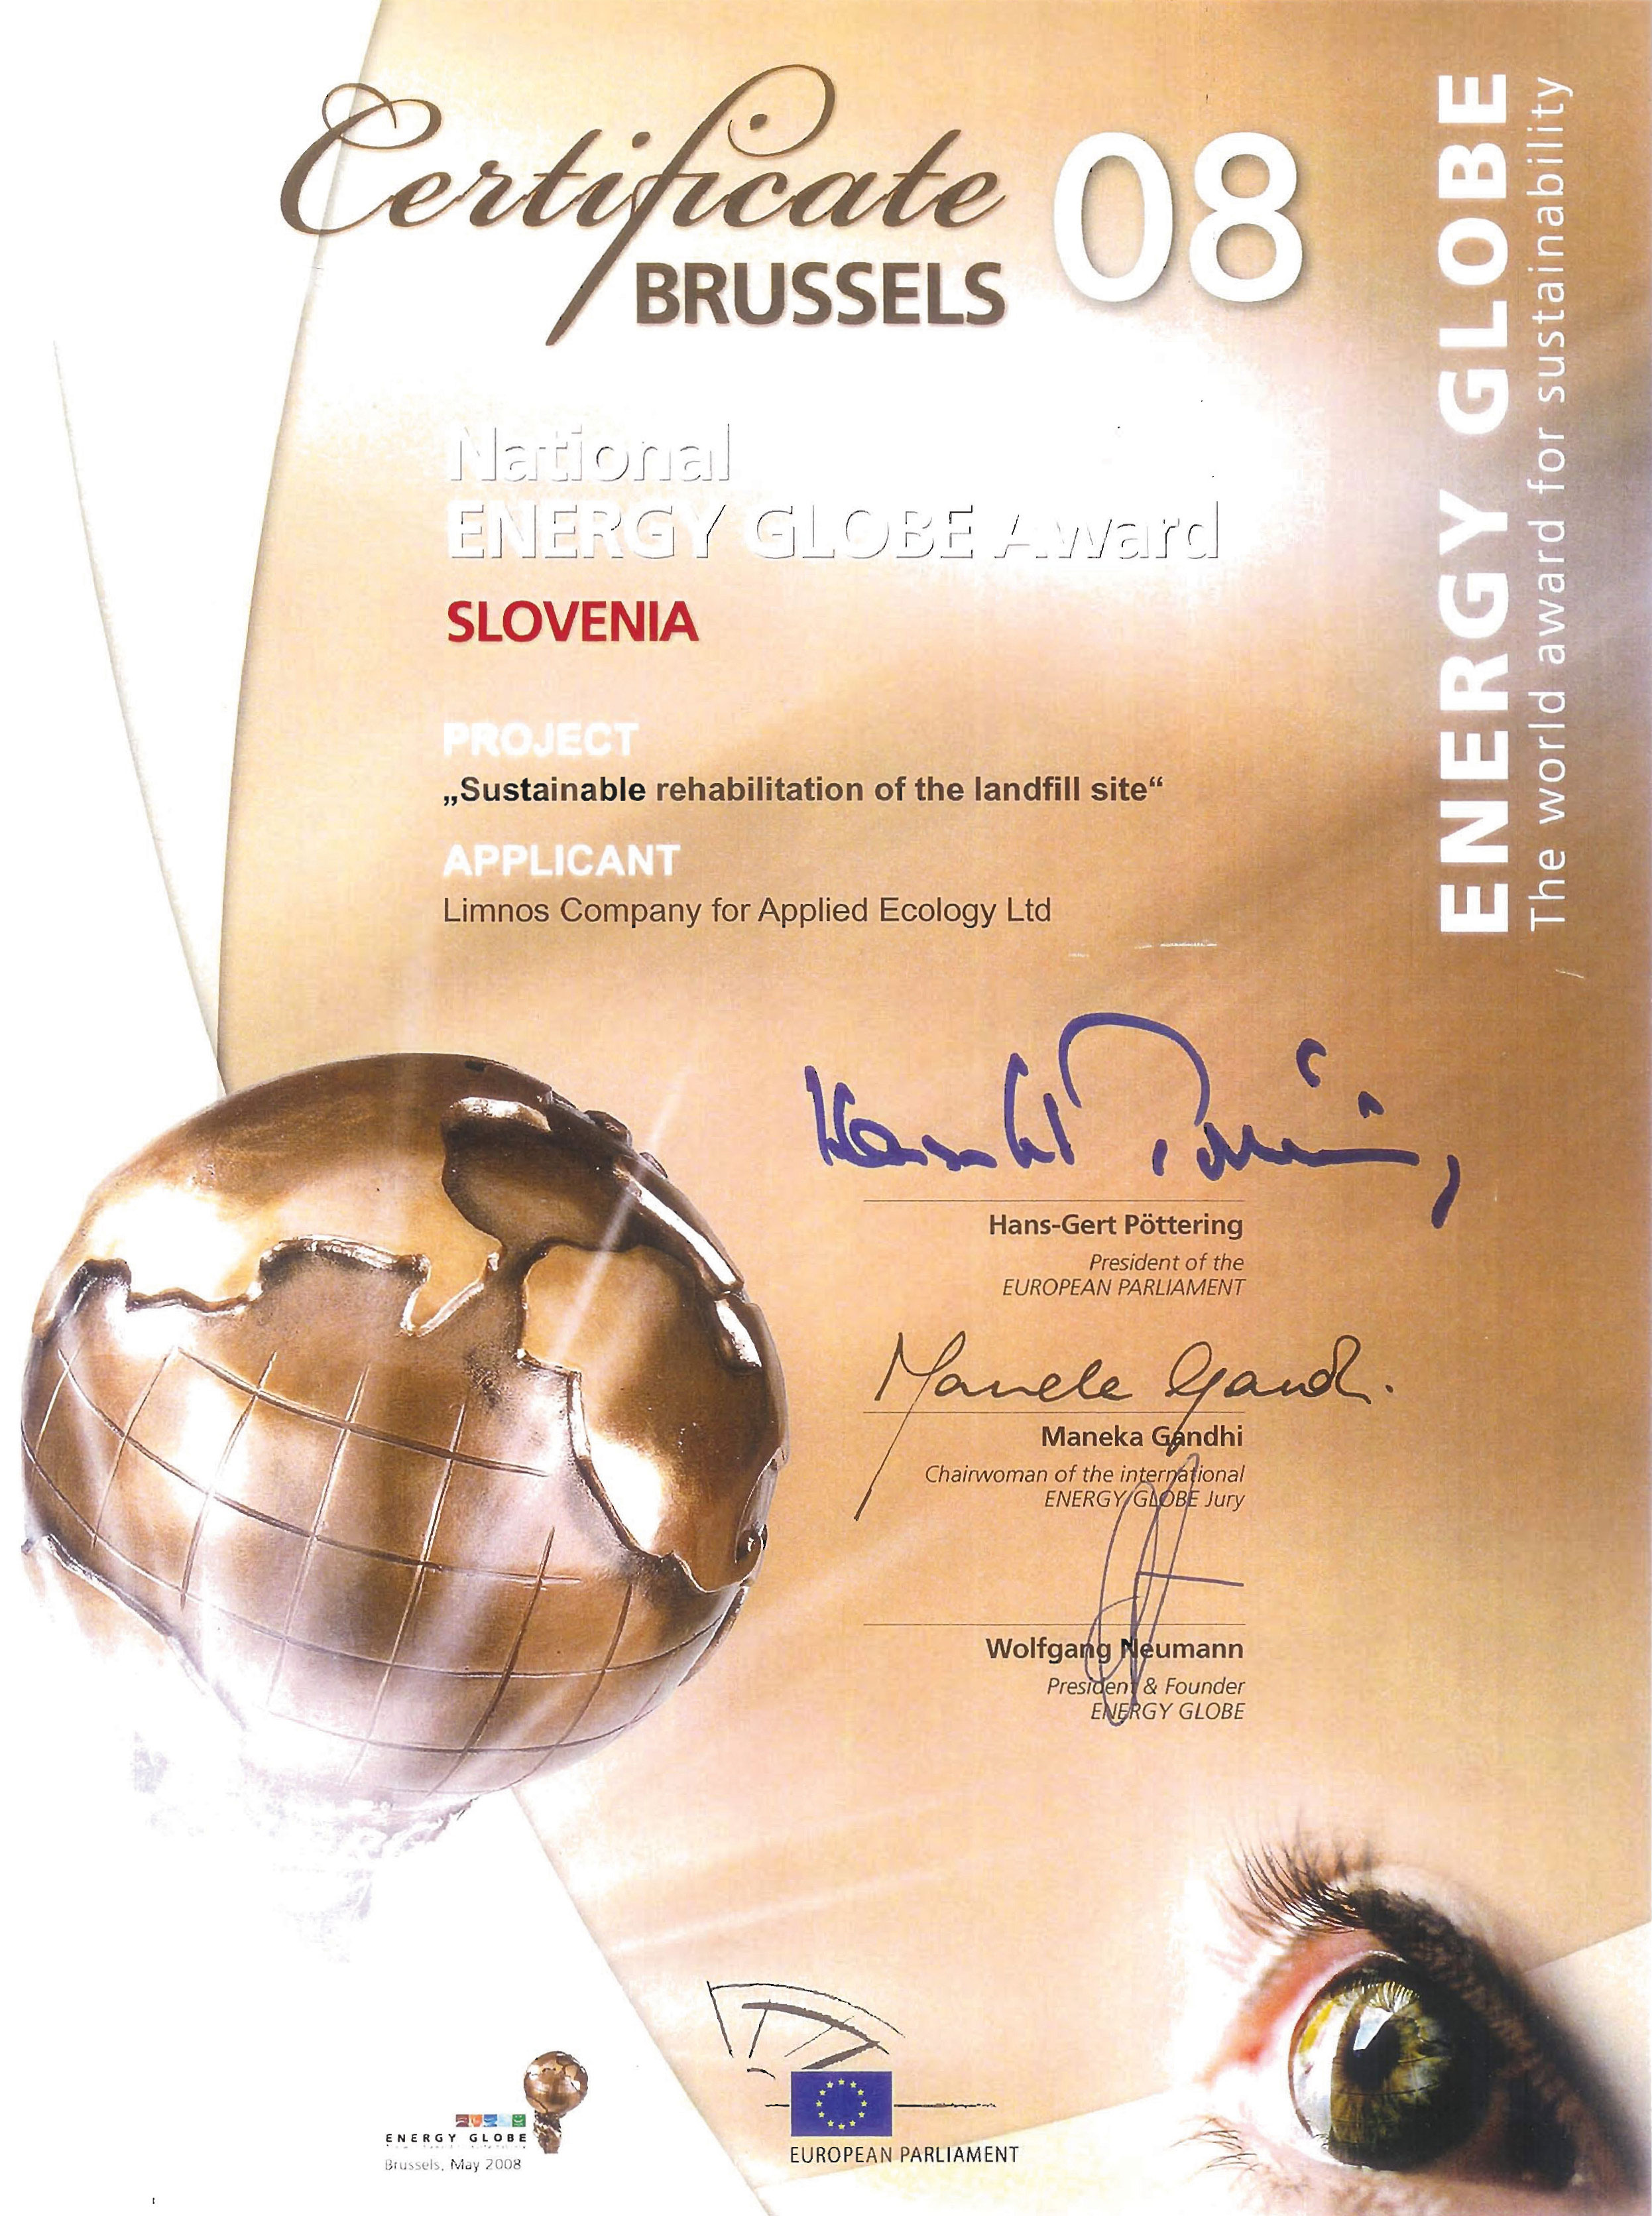 National Energy Globe Award 2008